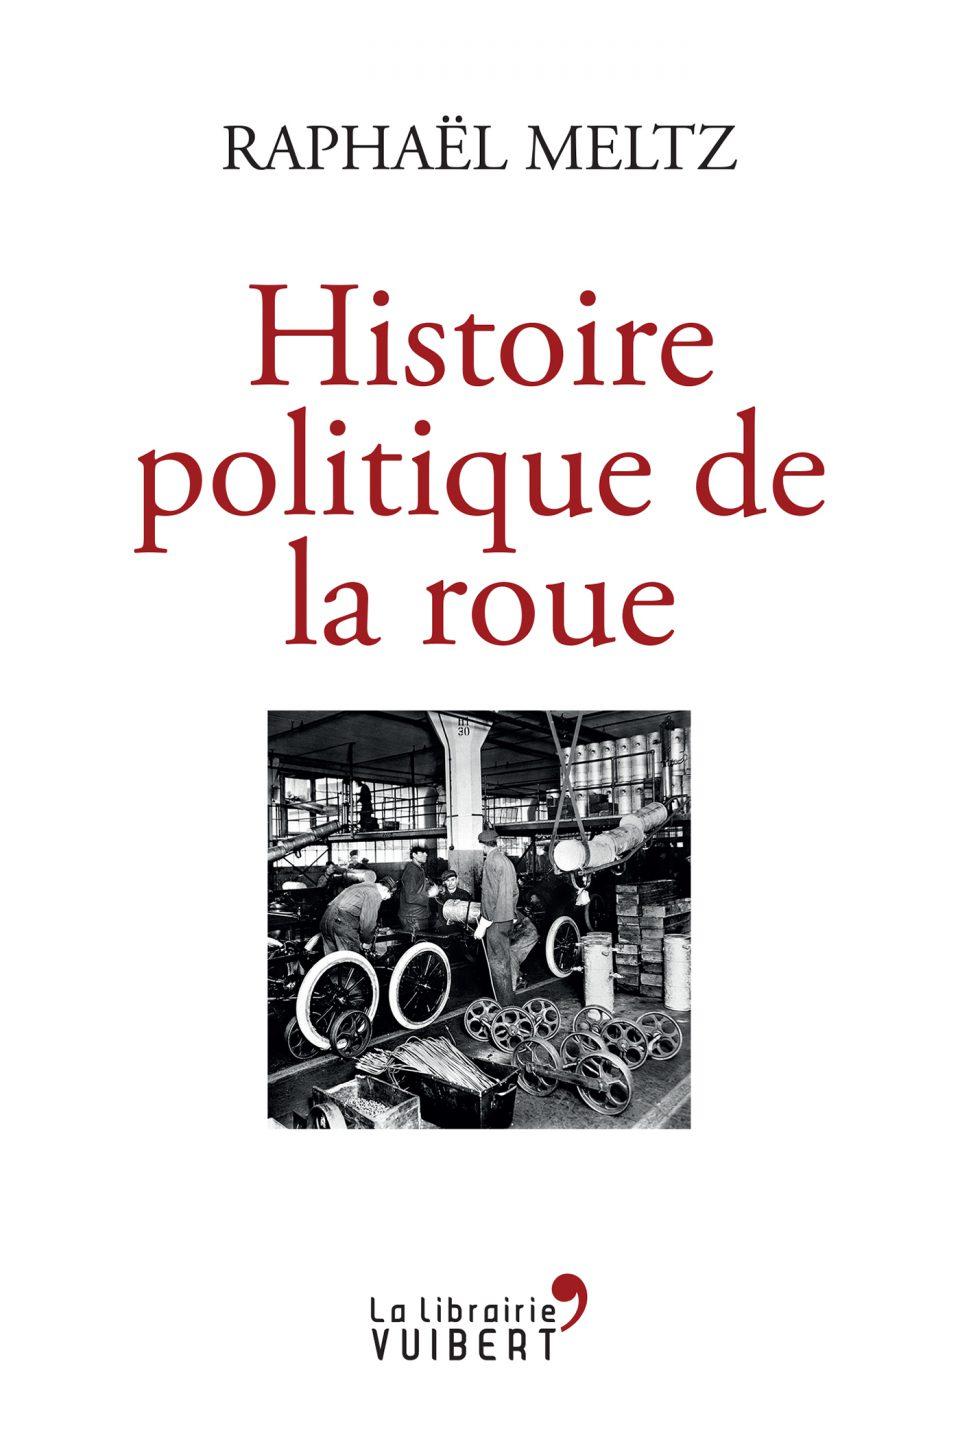 R. Metz, Histoire politique de la roue